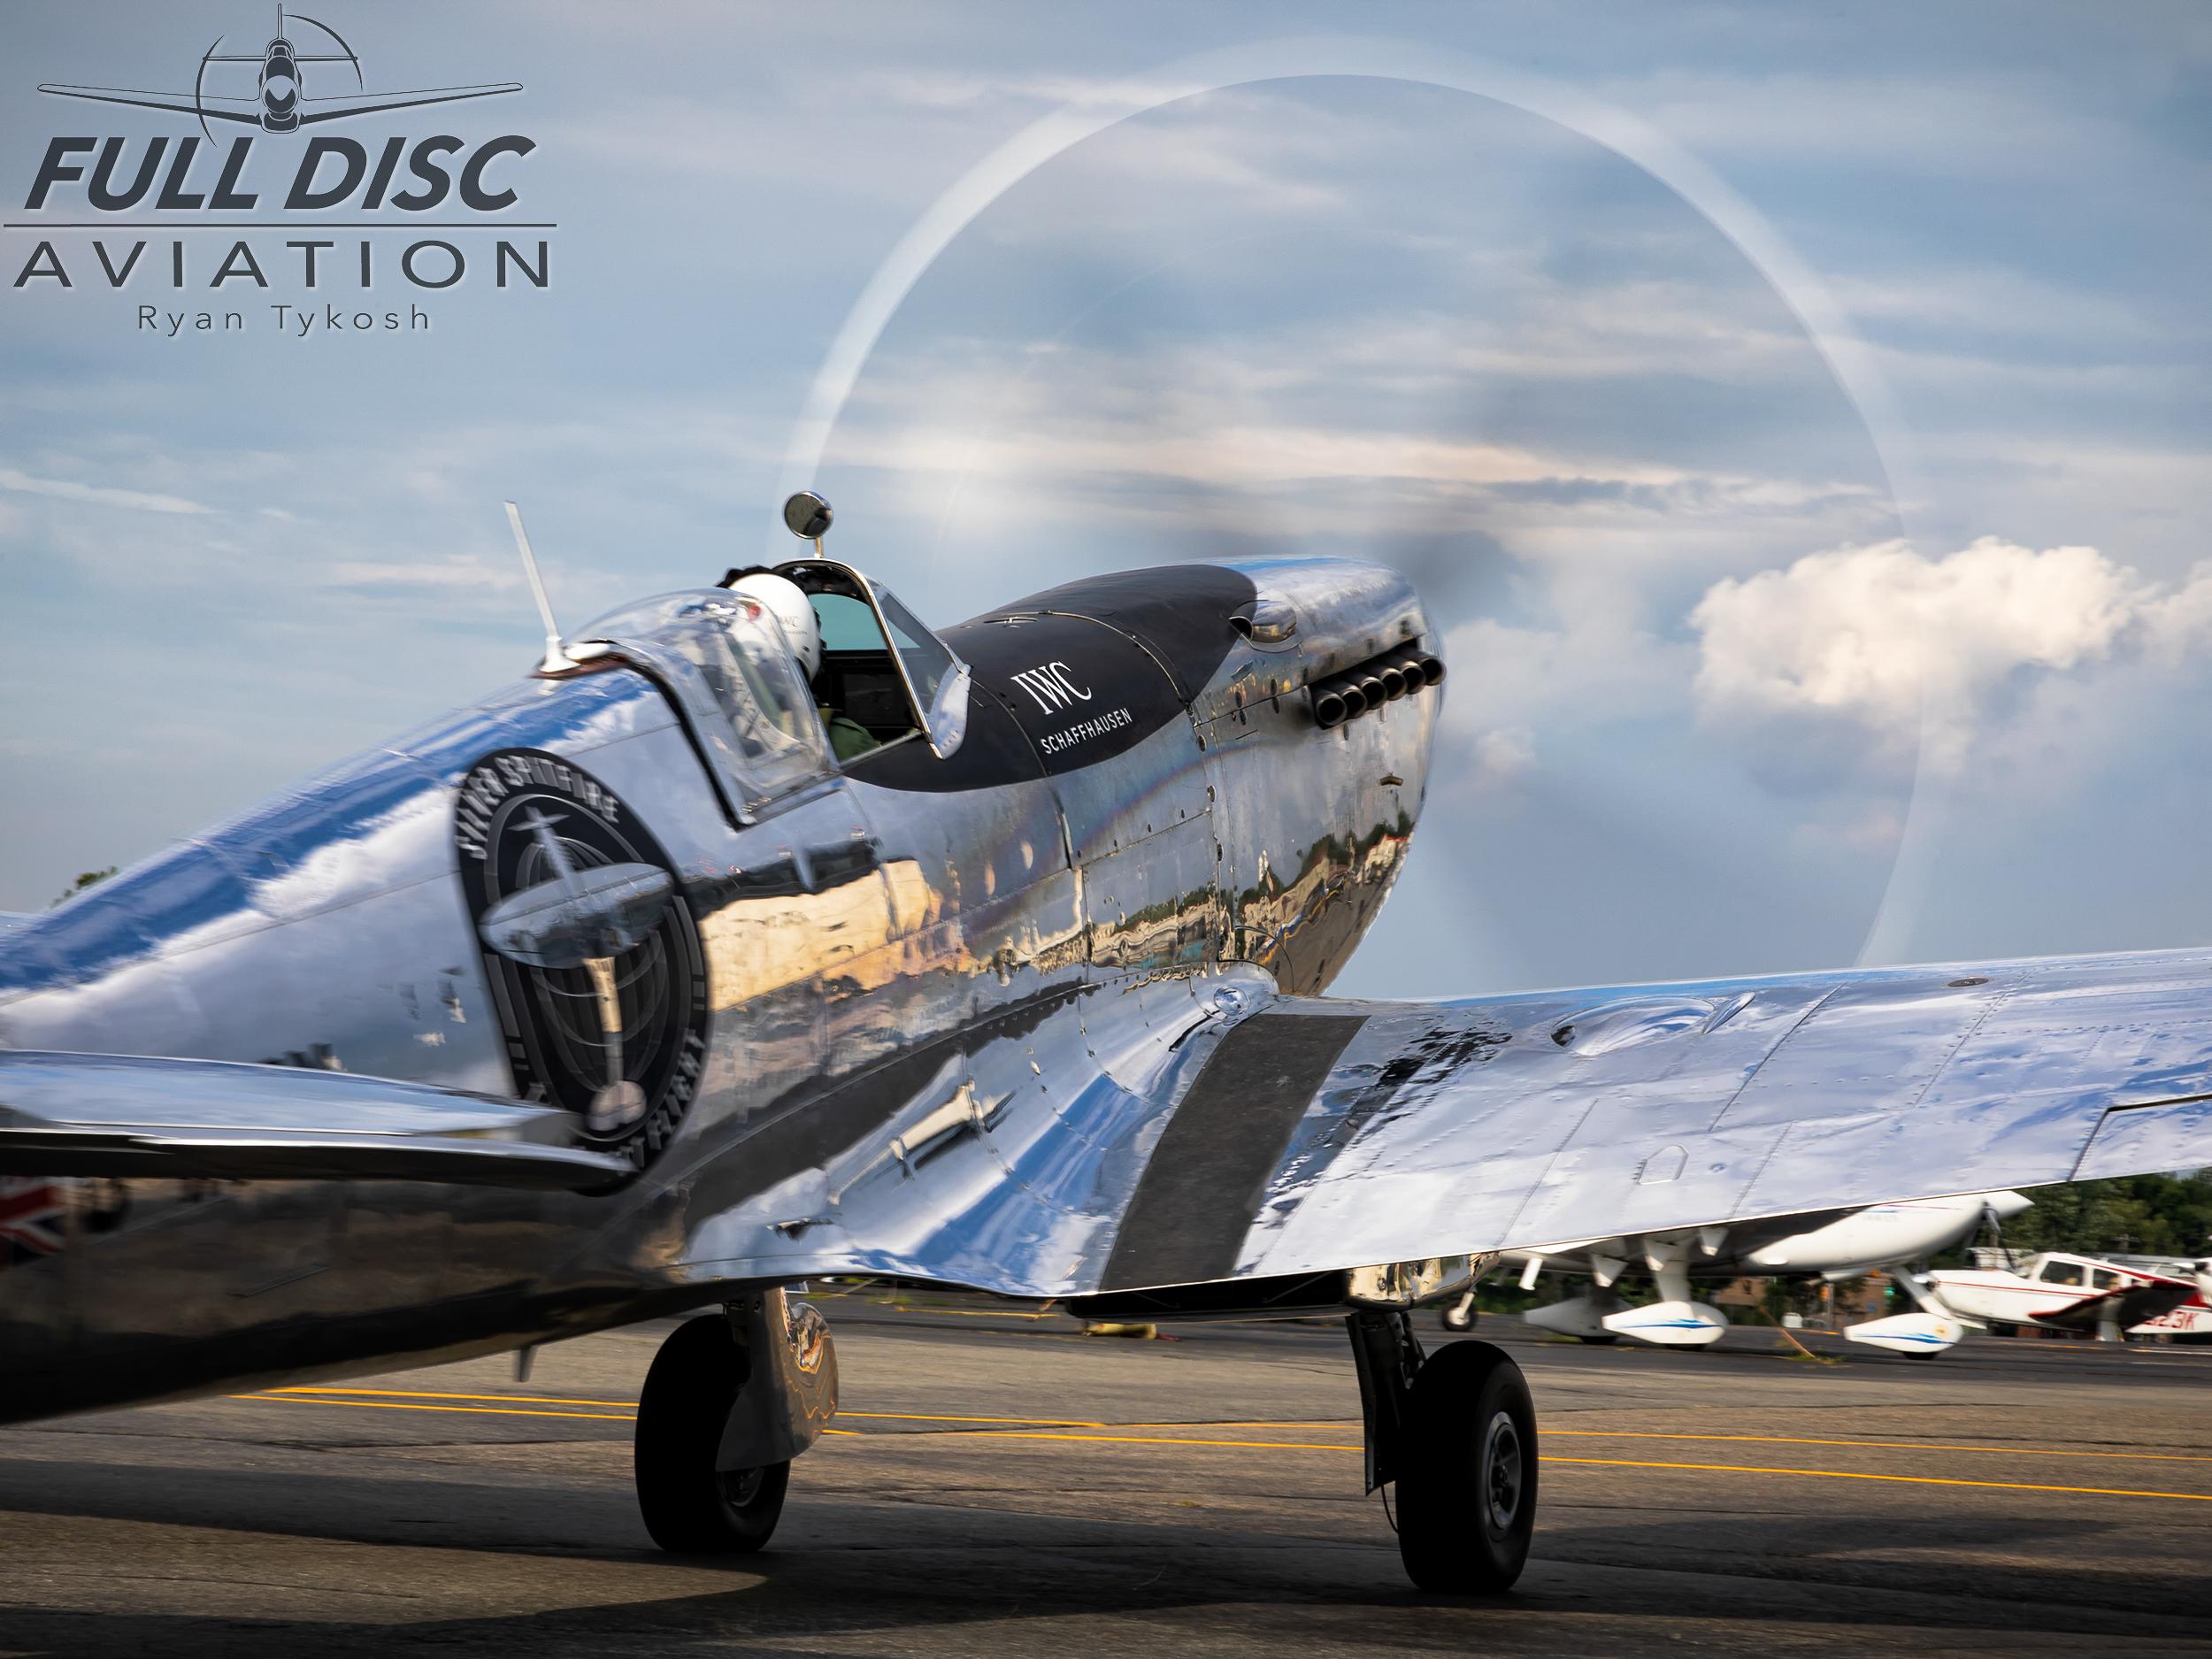 Silver Spitfire - Full Disc Aviation - Ryan Tykosh_August 21, 2019_04.jpg